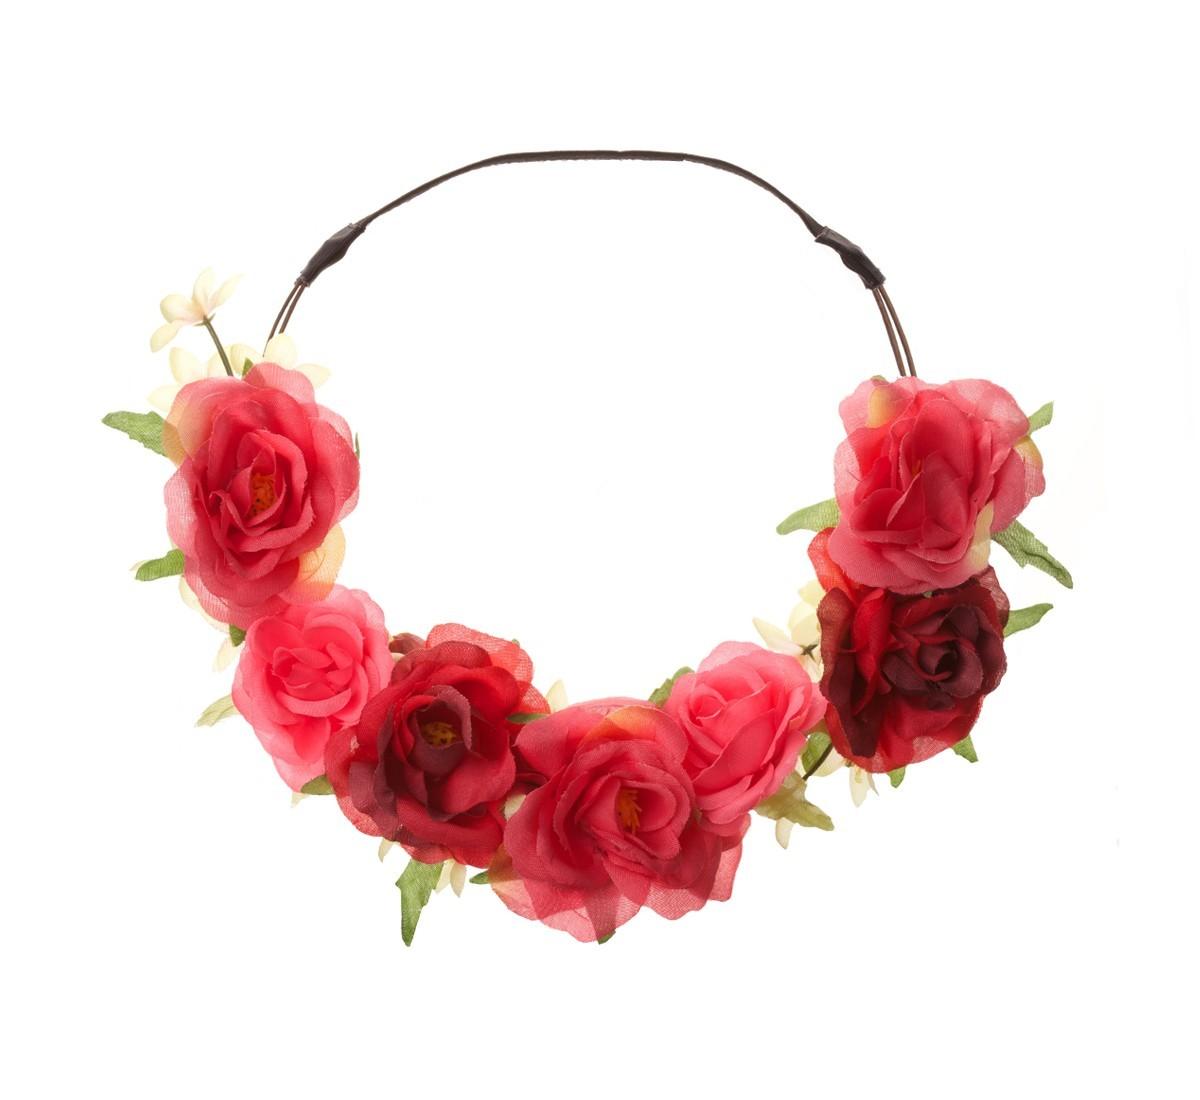 flower crown: NEW 813 FLOWER CROWN CLIP ART